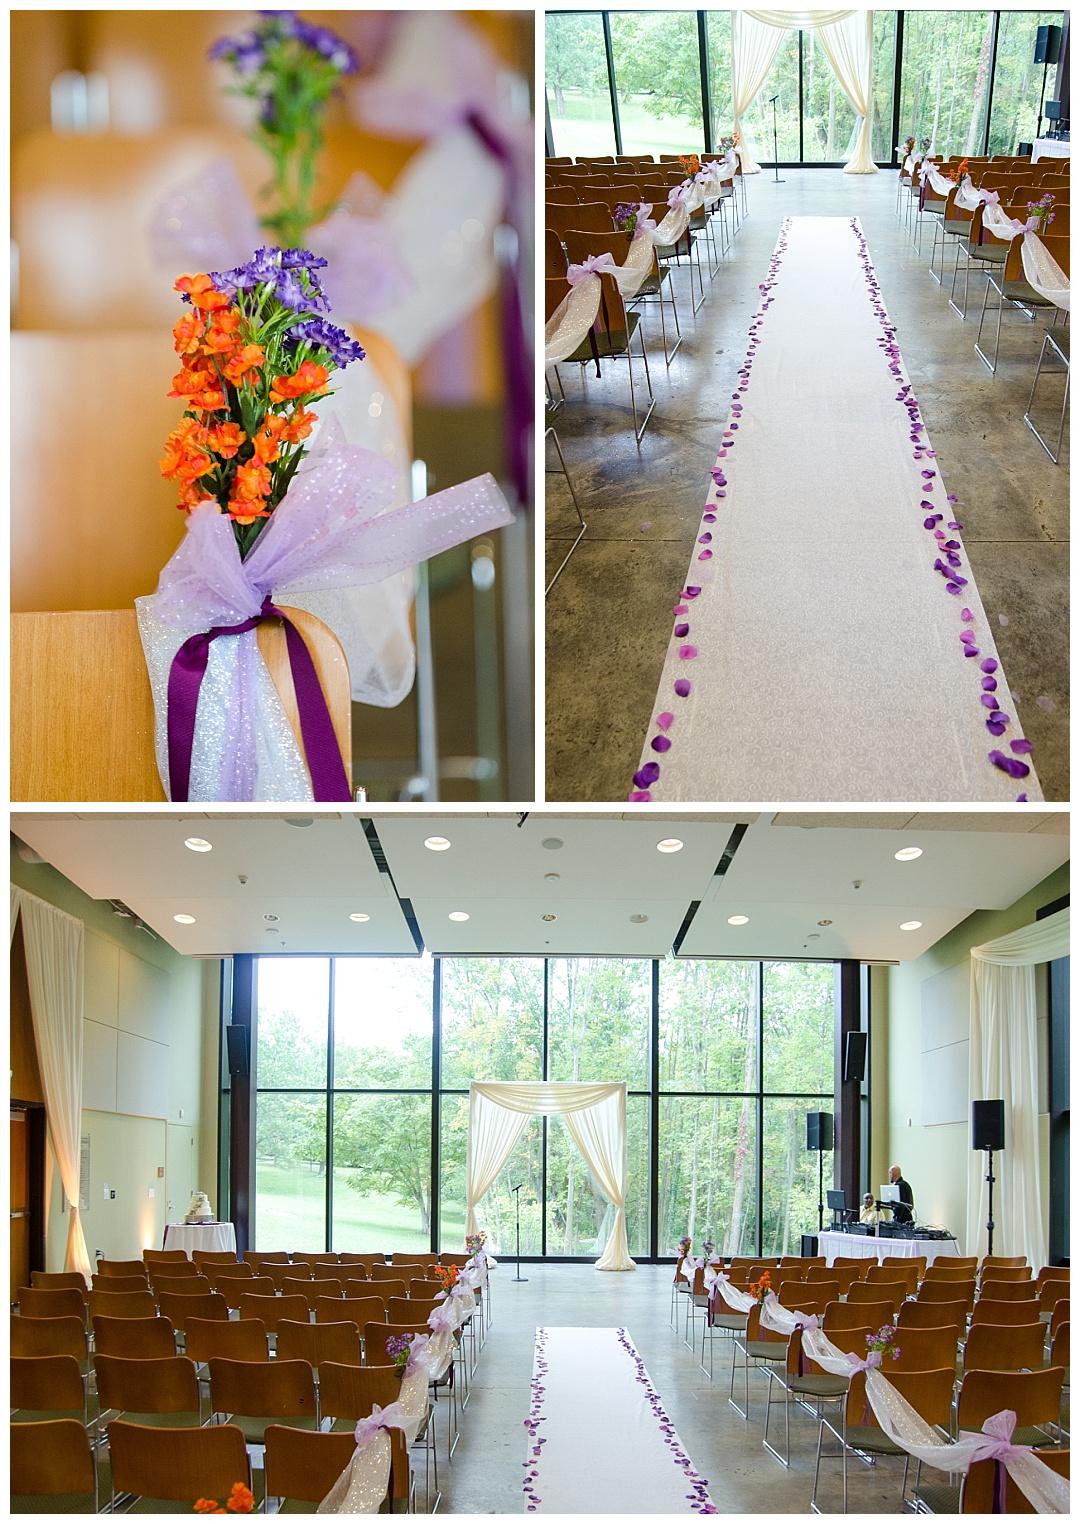 Cylburn Arboretum wedding ceremony purple colorful decorations